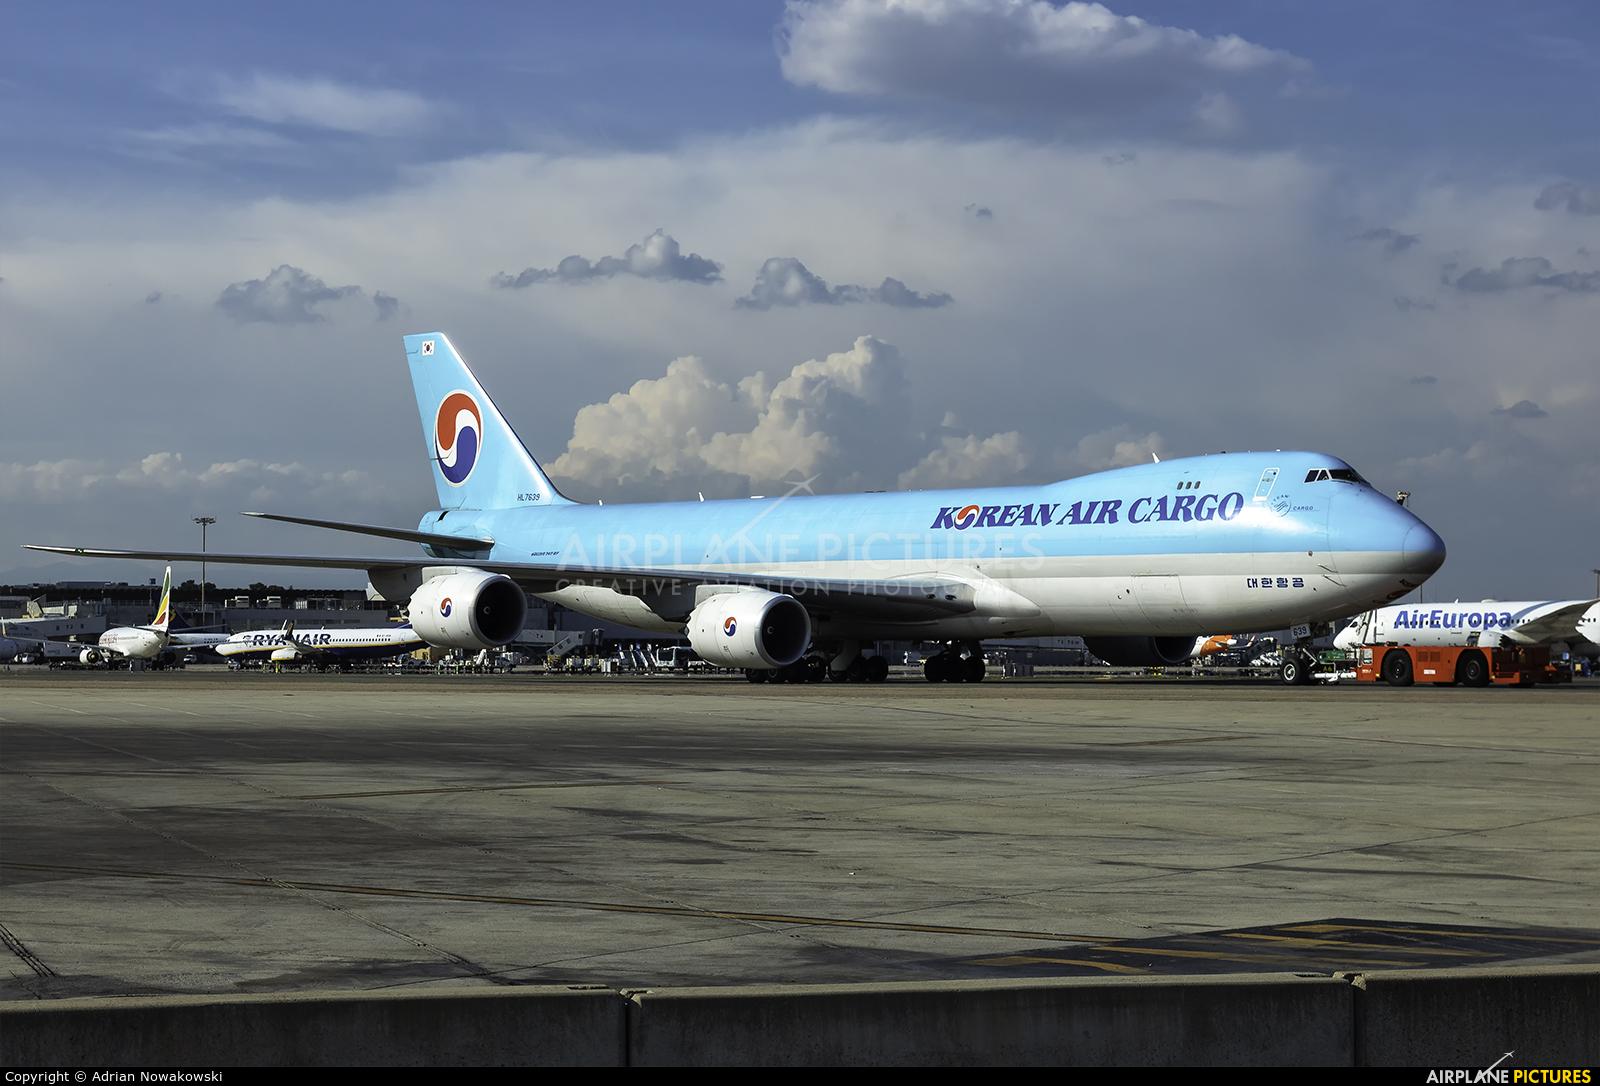 Korean Air Cargo HL7639 aircraft at Madrid - Barajas